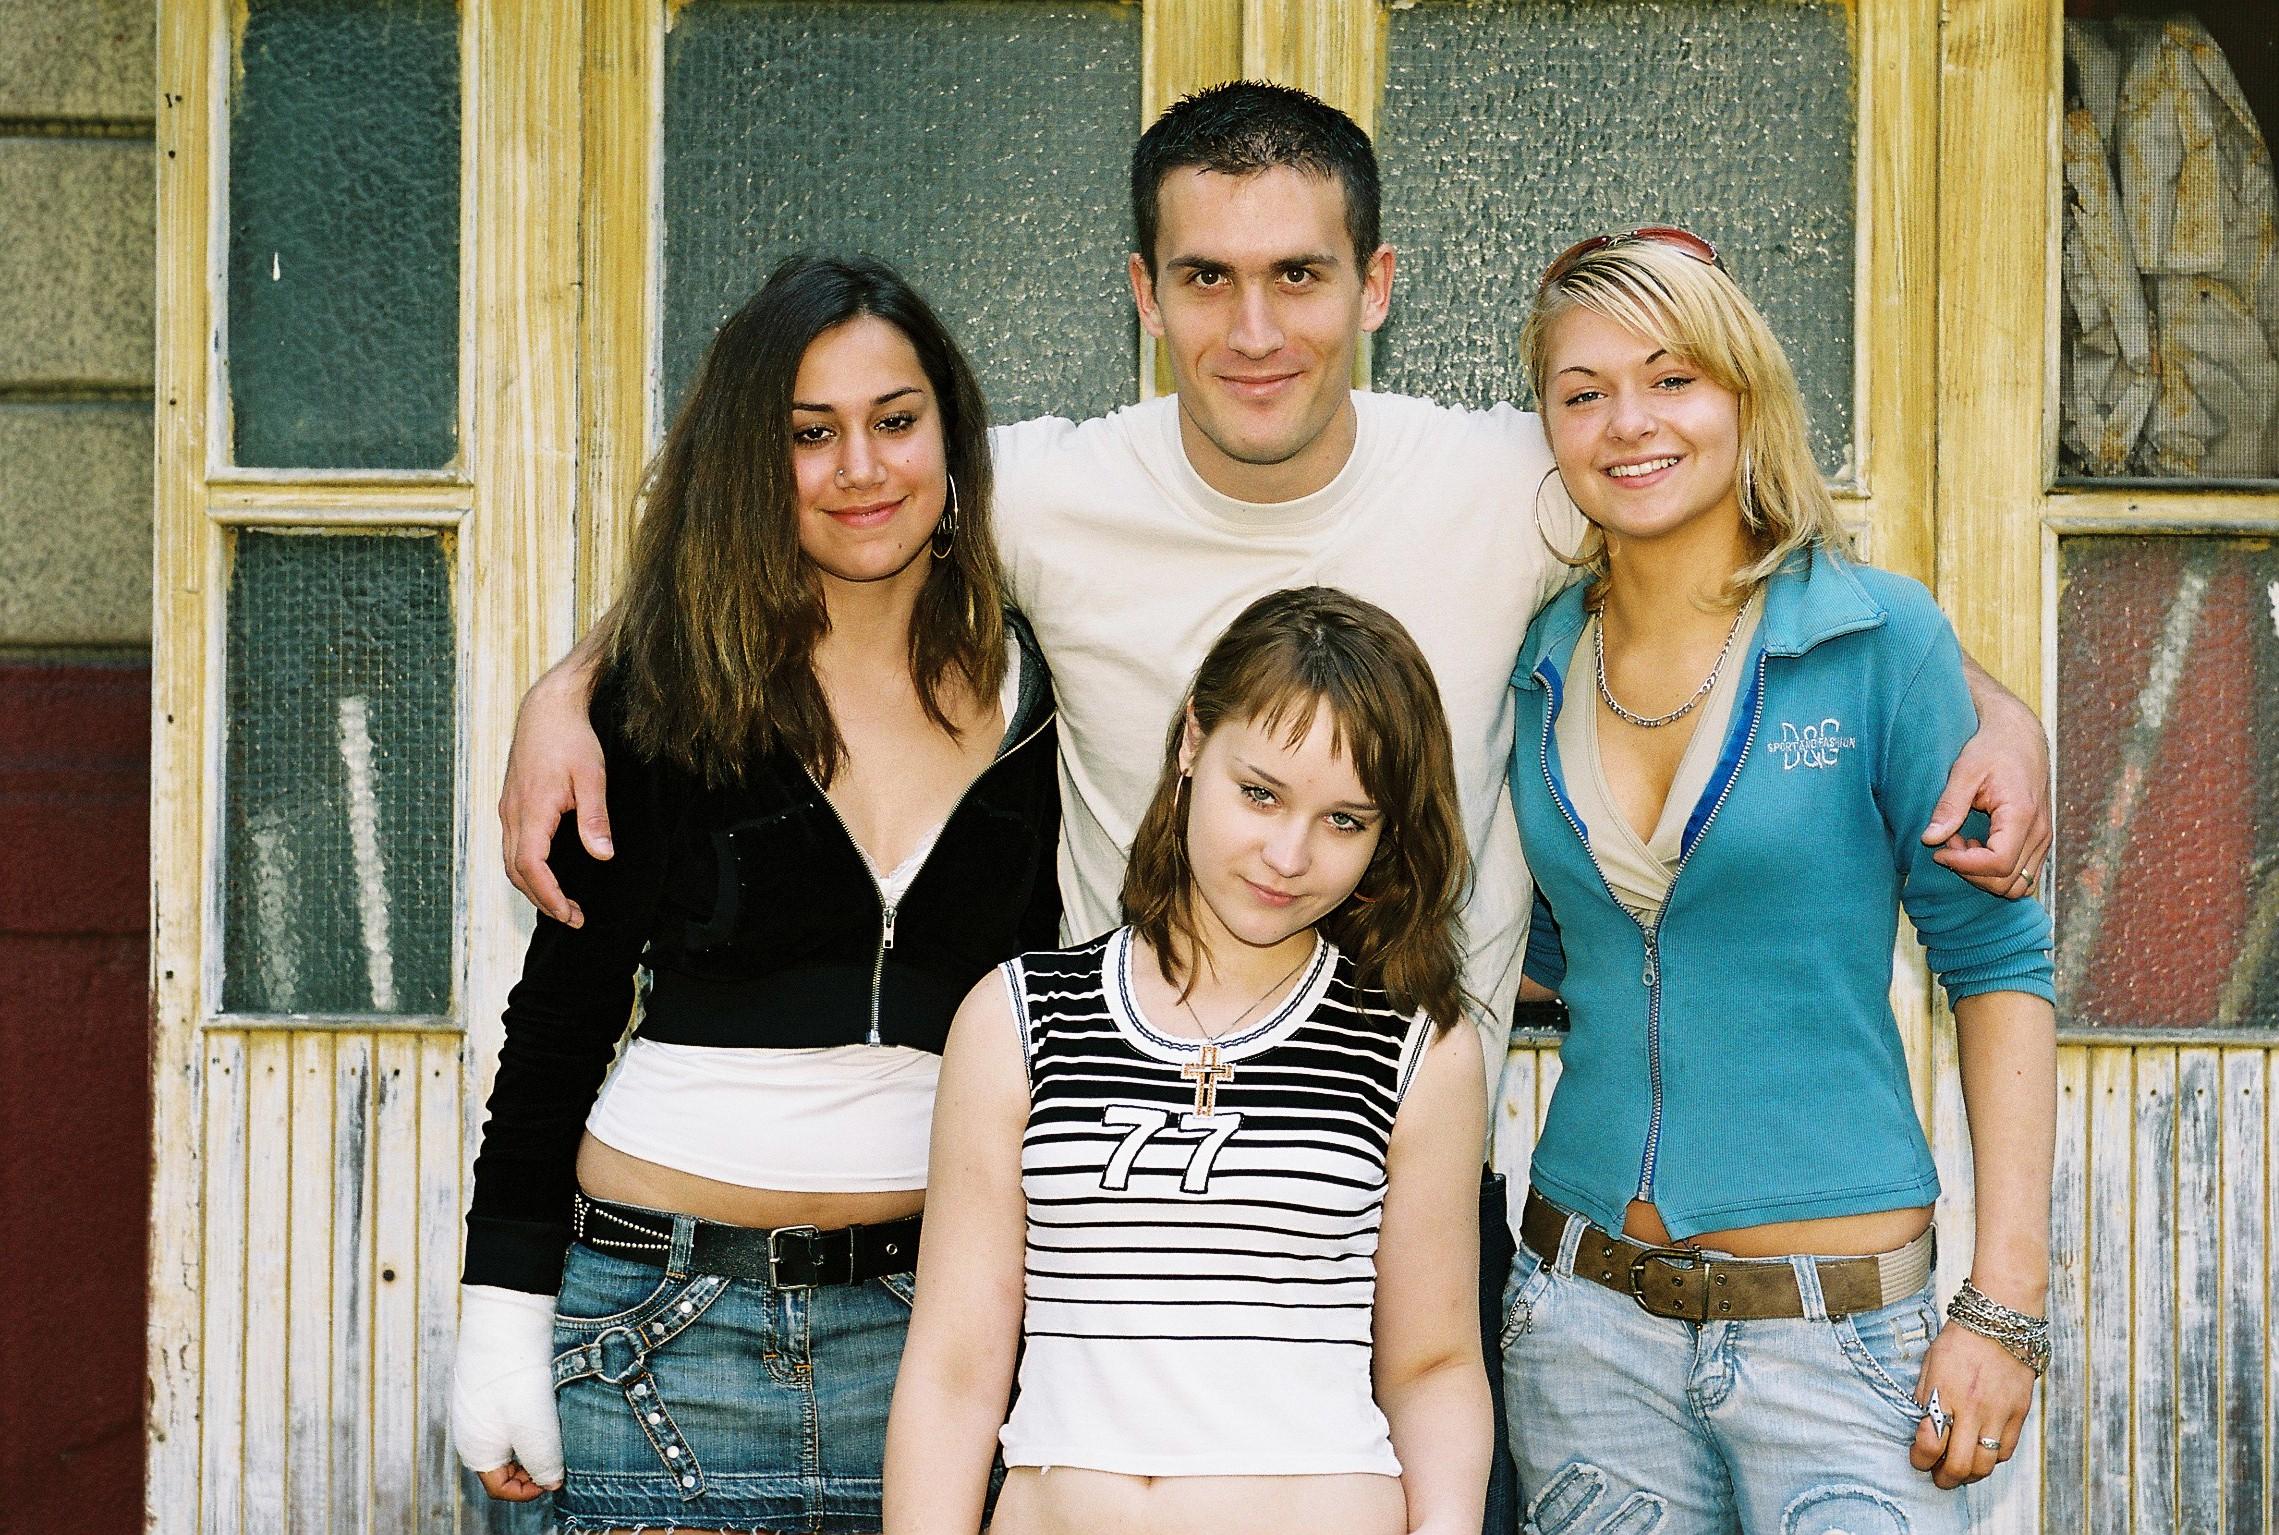 Skupinkové fotografie 2005/2006